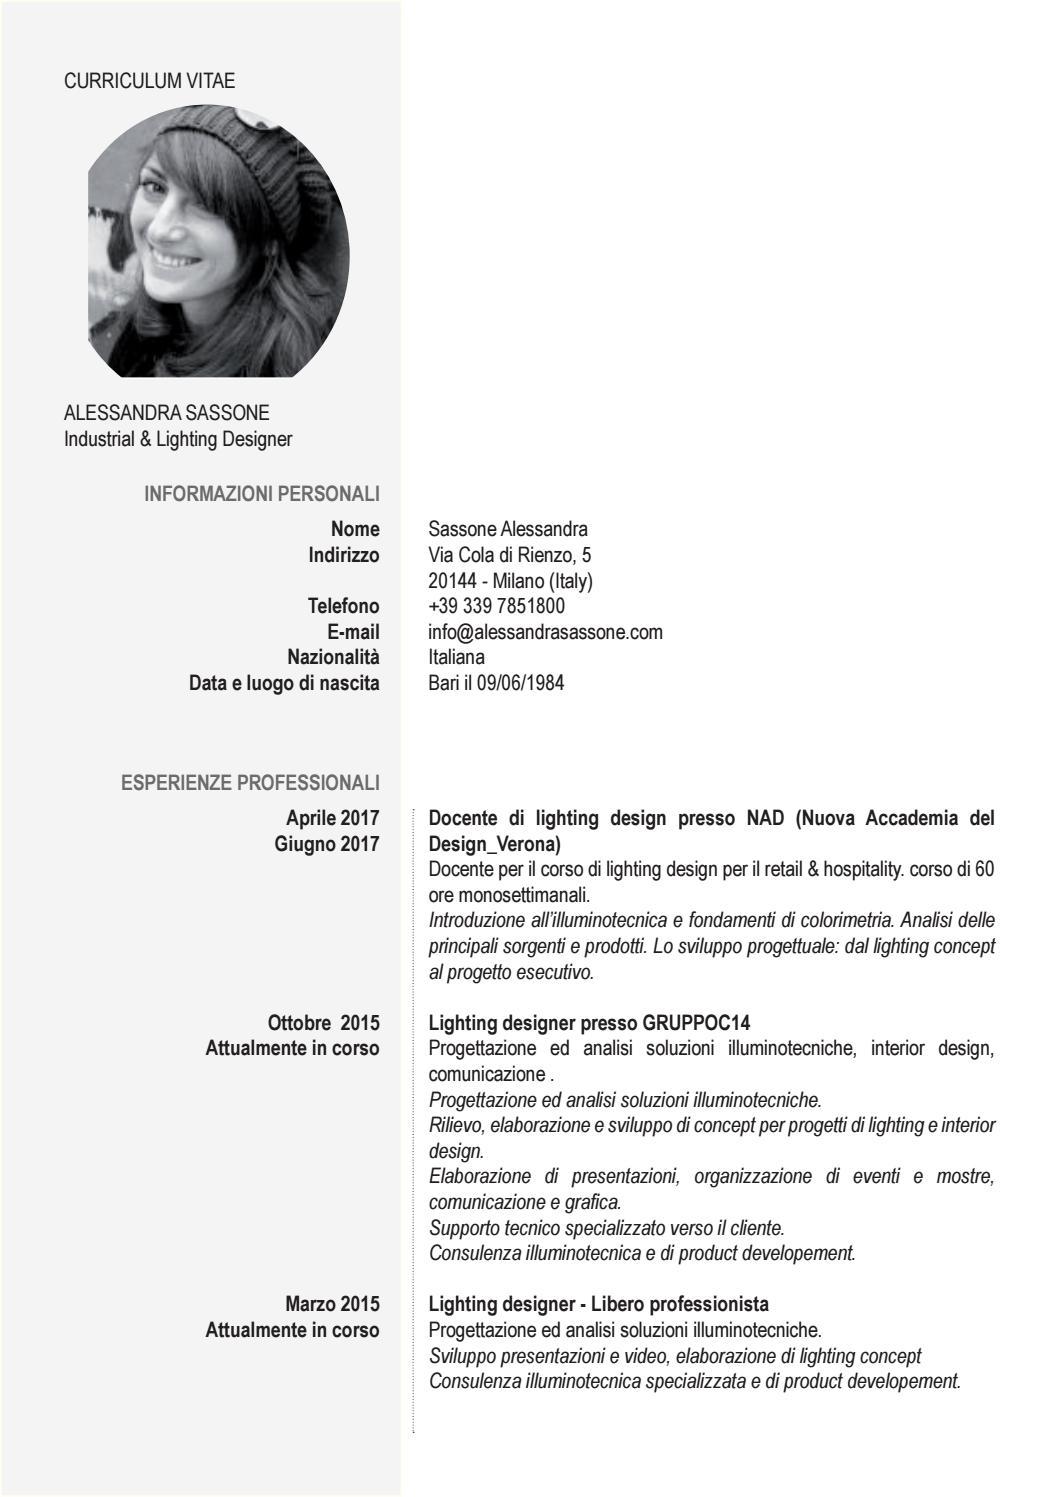 Nuova Accademia Del Design cv alessandra sassone ita eng by alessandra sassone - issuu